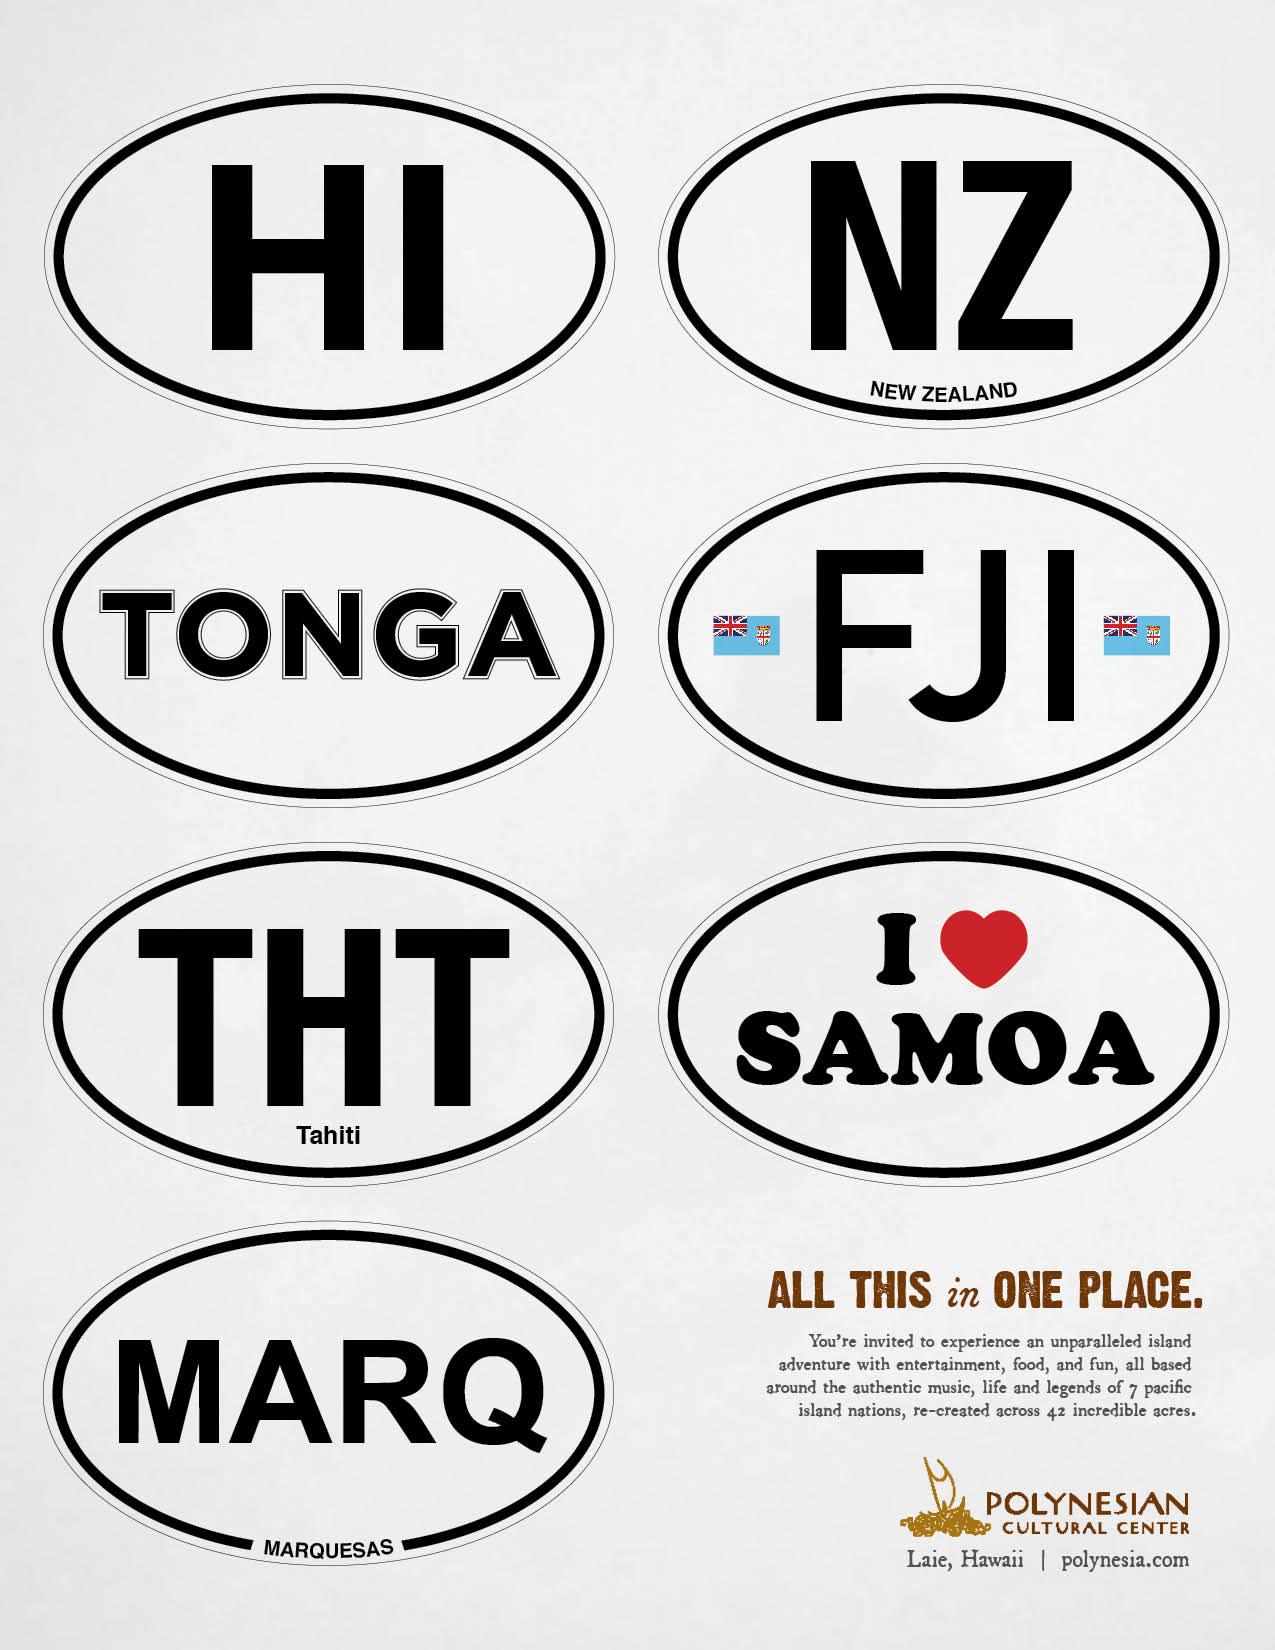 Hawaii, New Zealand, Tonga, Fiji, Tahiti, Samoa, and Marquesas all in one place.